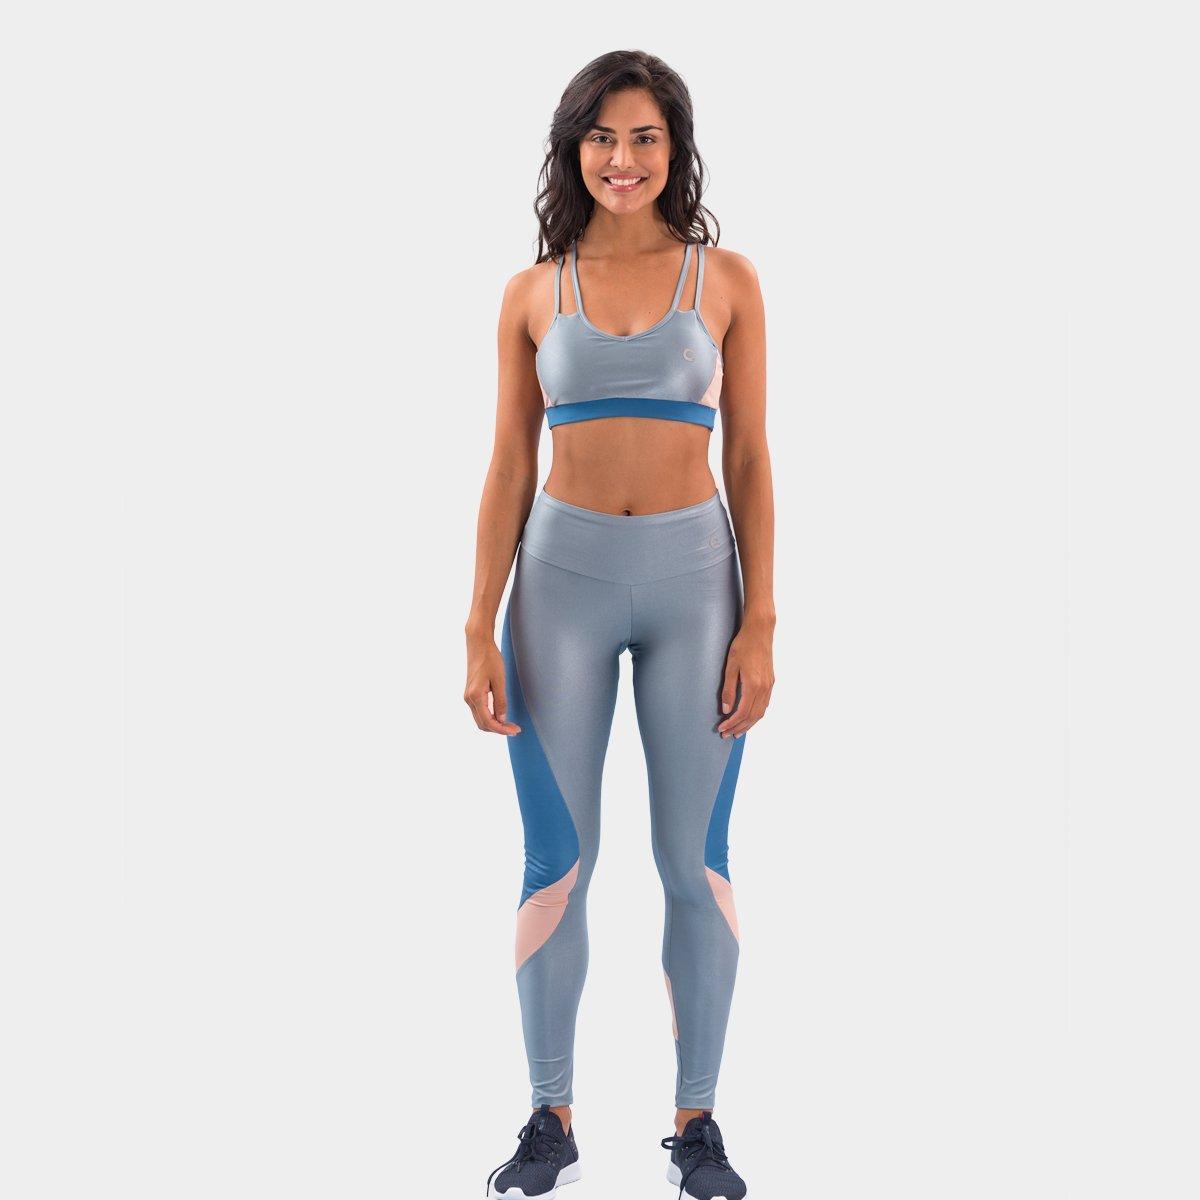 Calça Legging Área Sports Load Feminina - Tam: GG - 2